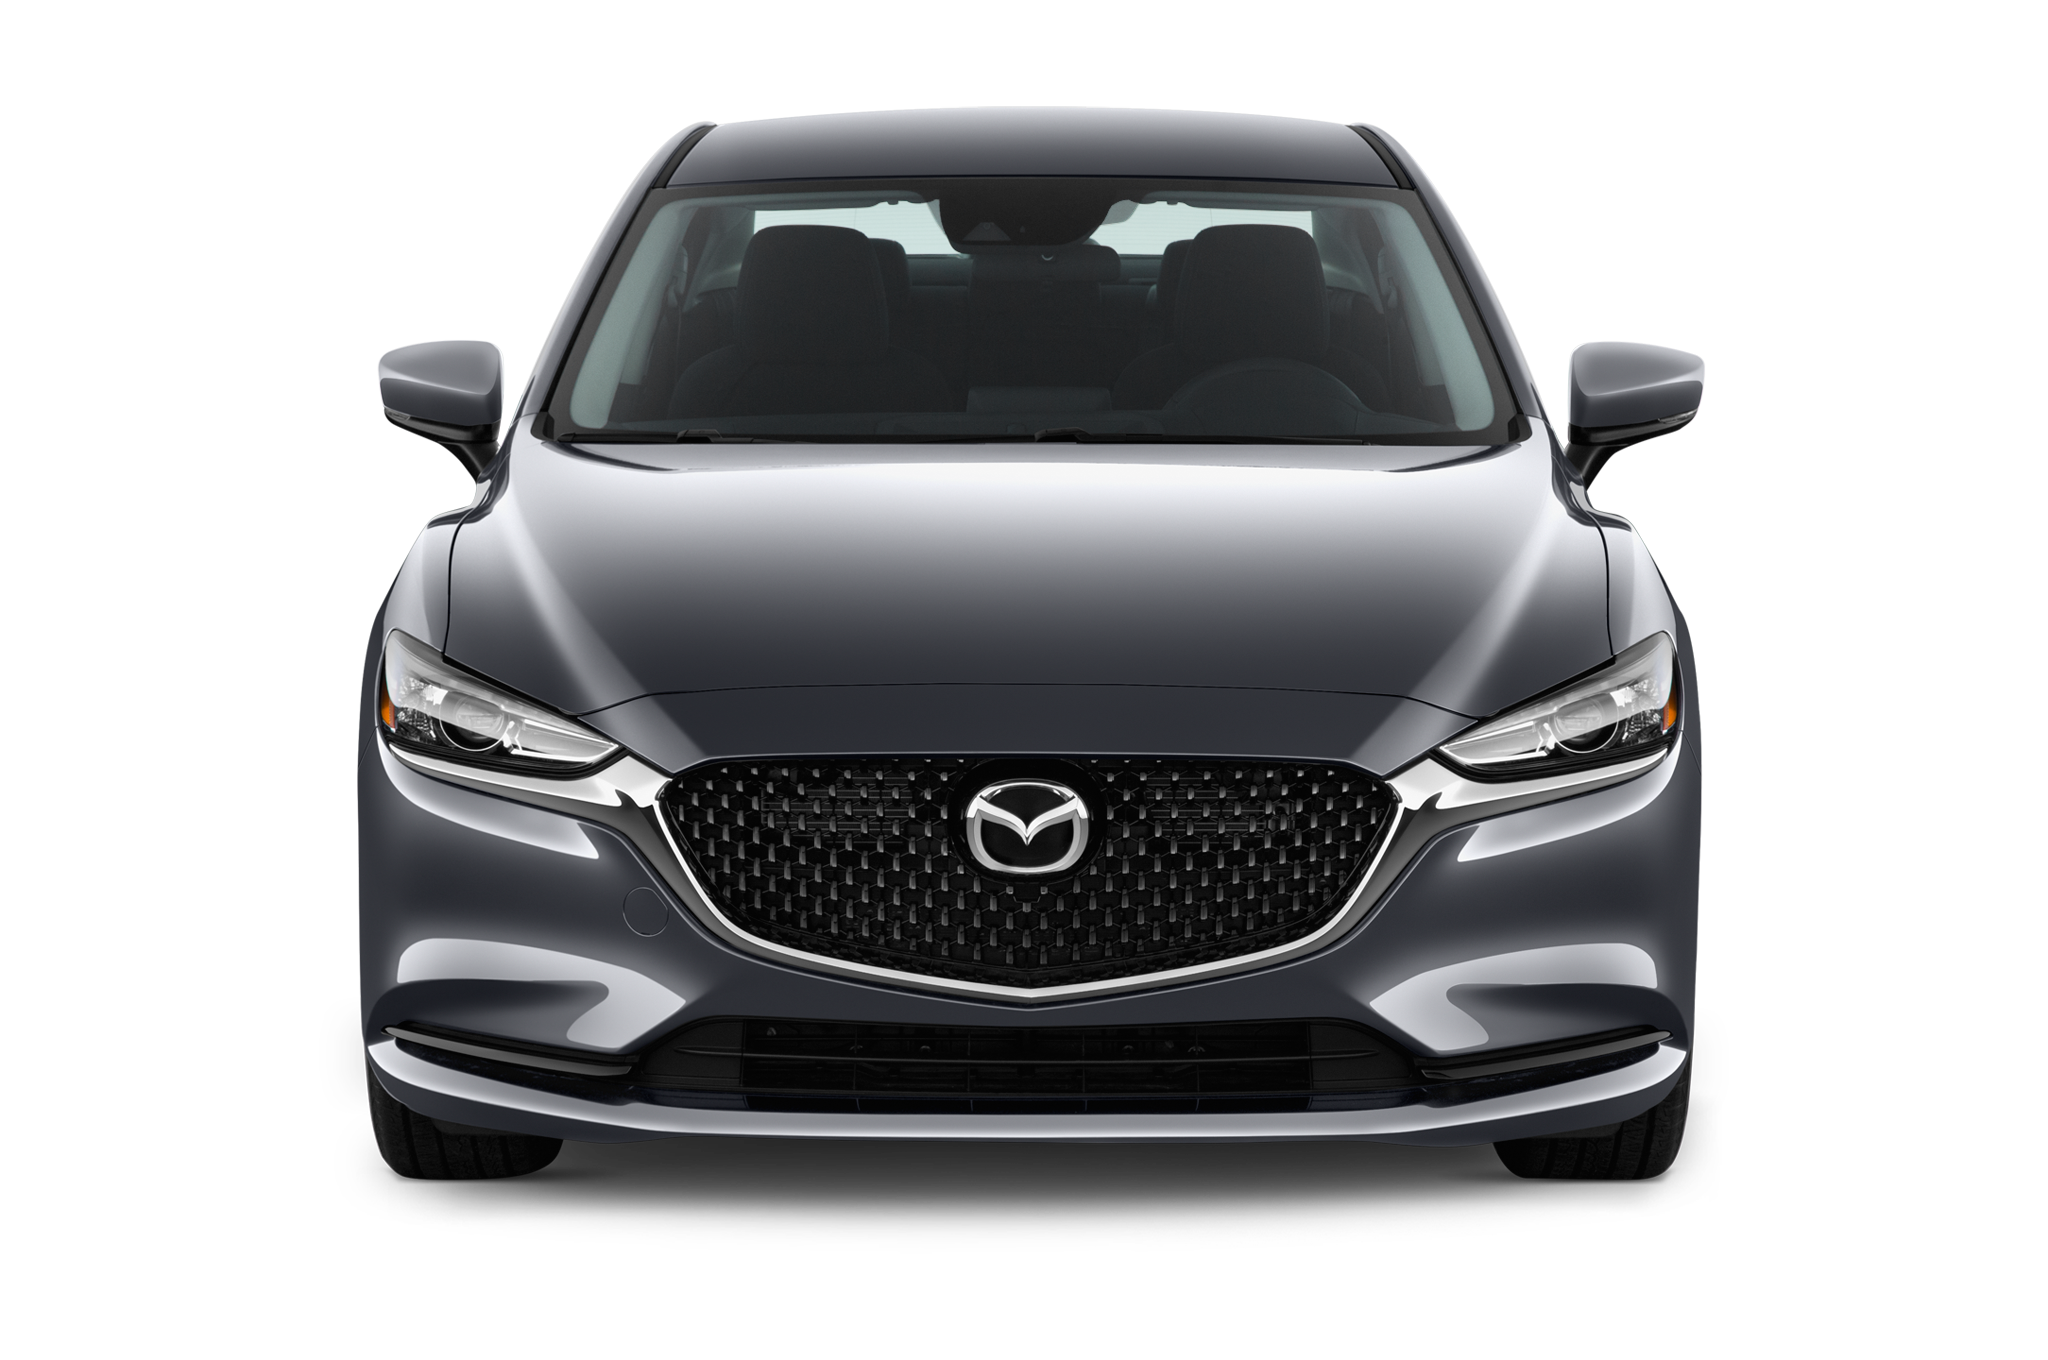 Mazda Mazda6: Essential Safety Equipment